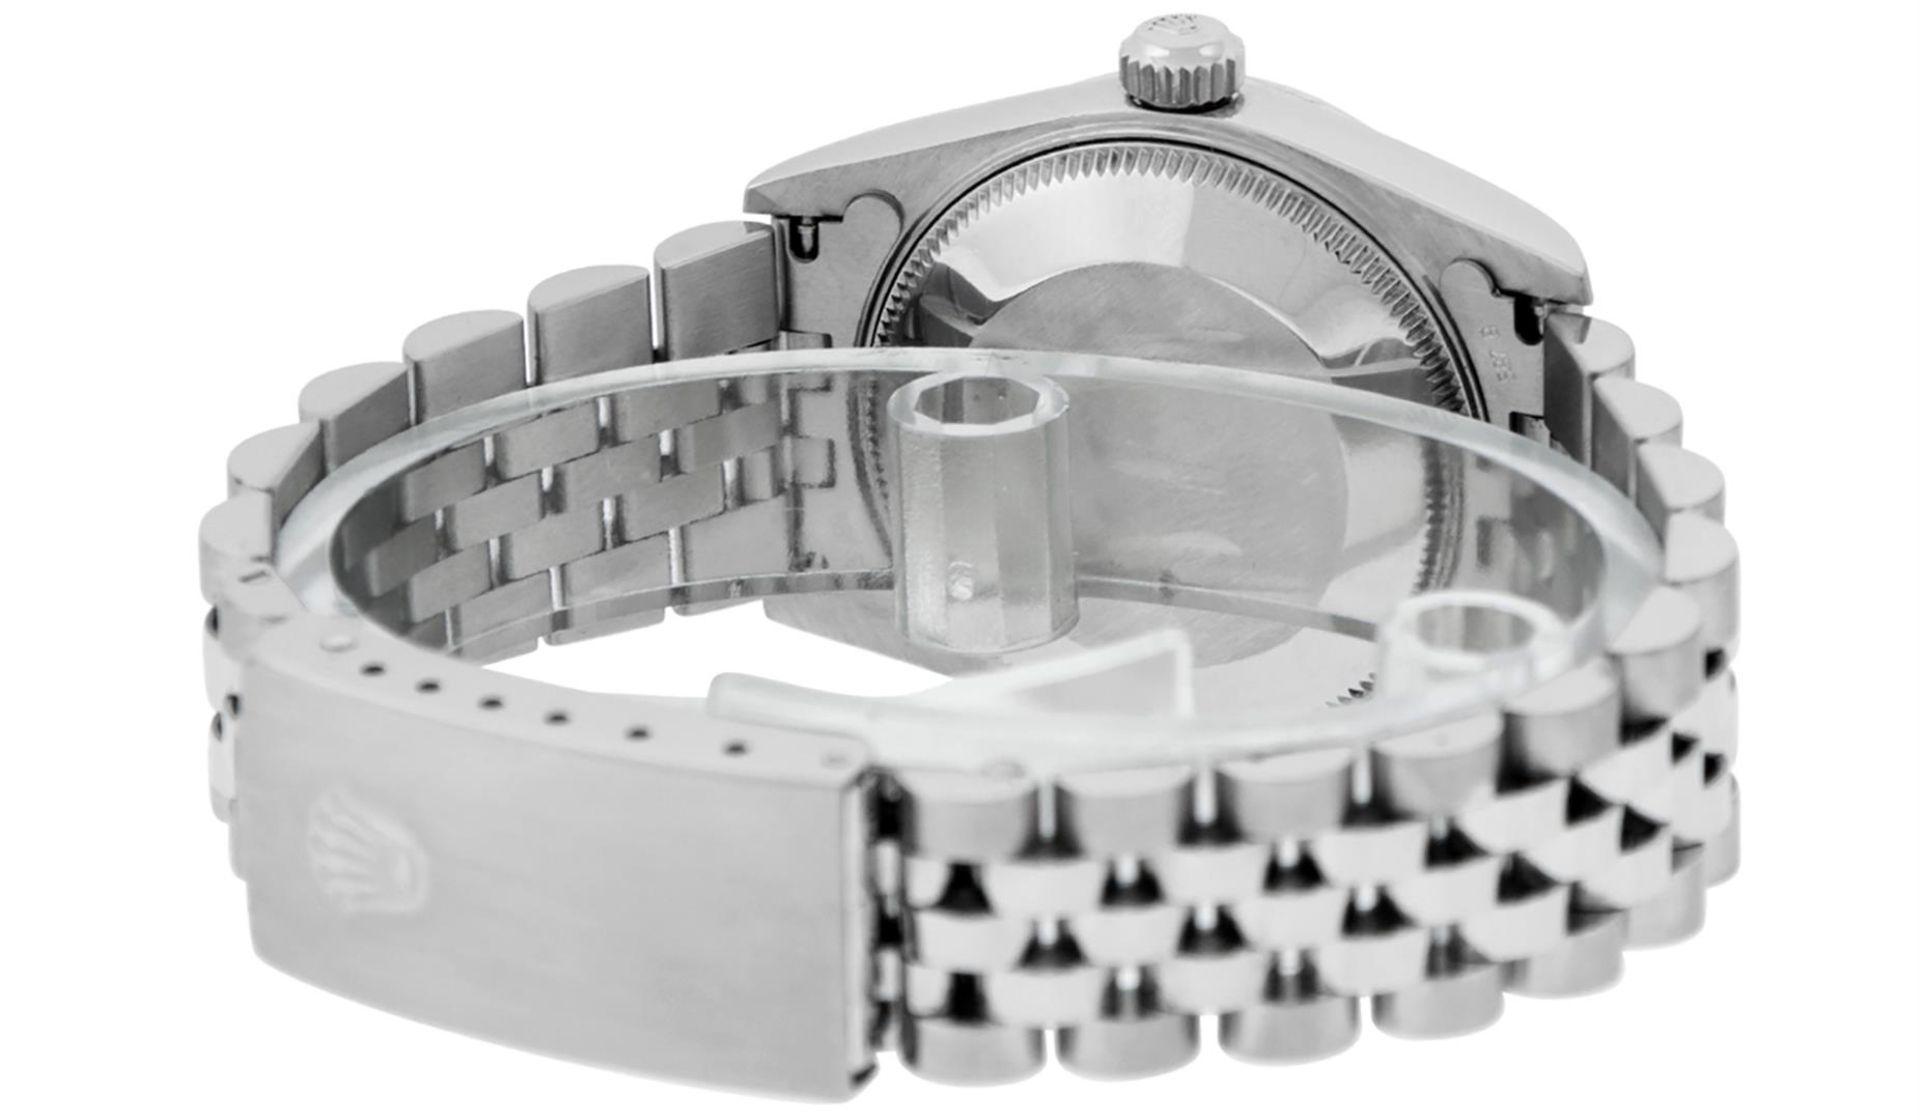 Rolex Womens Midsize Quickset 31mm MOP Diamond Stainless Steel Datejust Wriswatc - Image 7 of 9